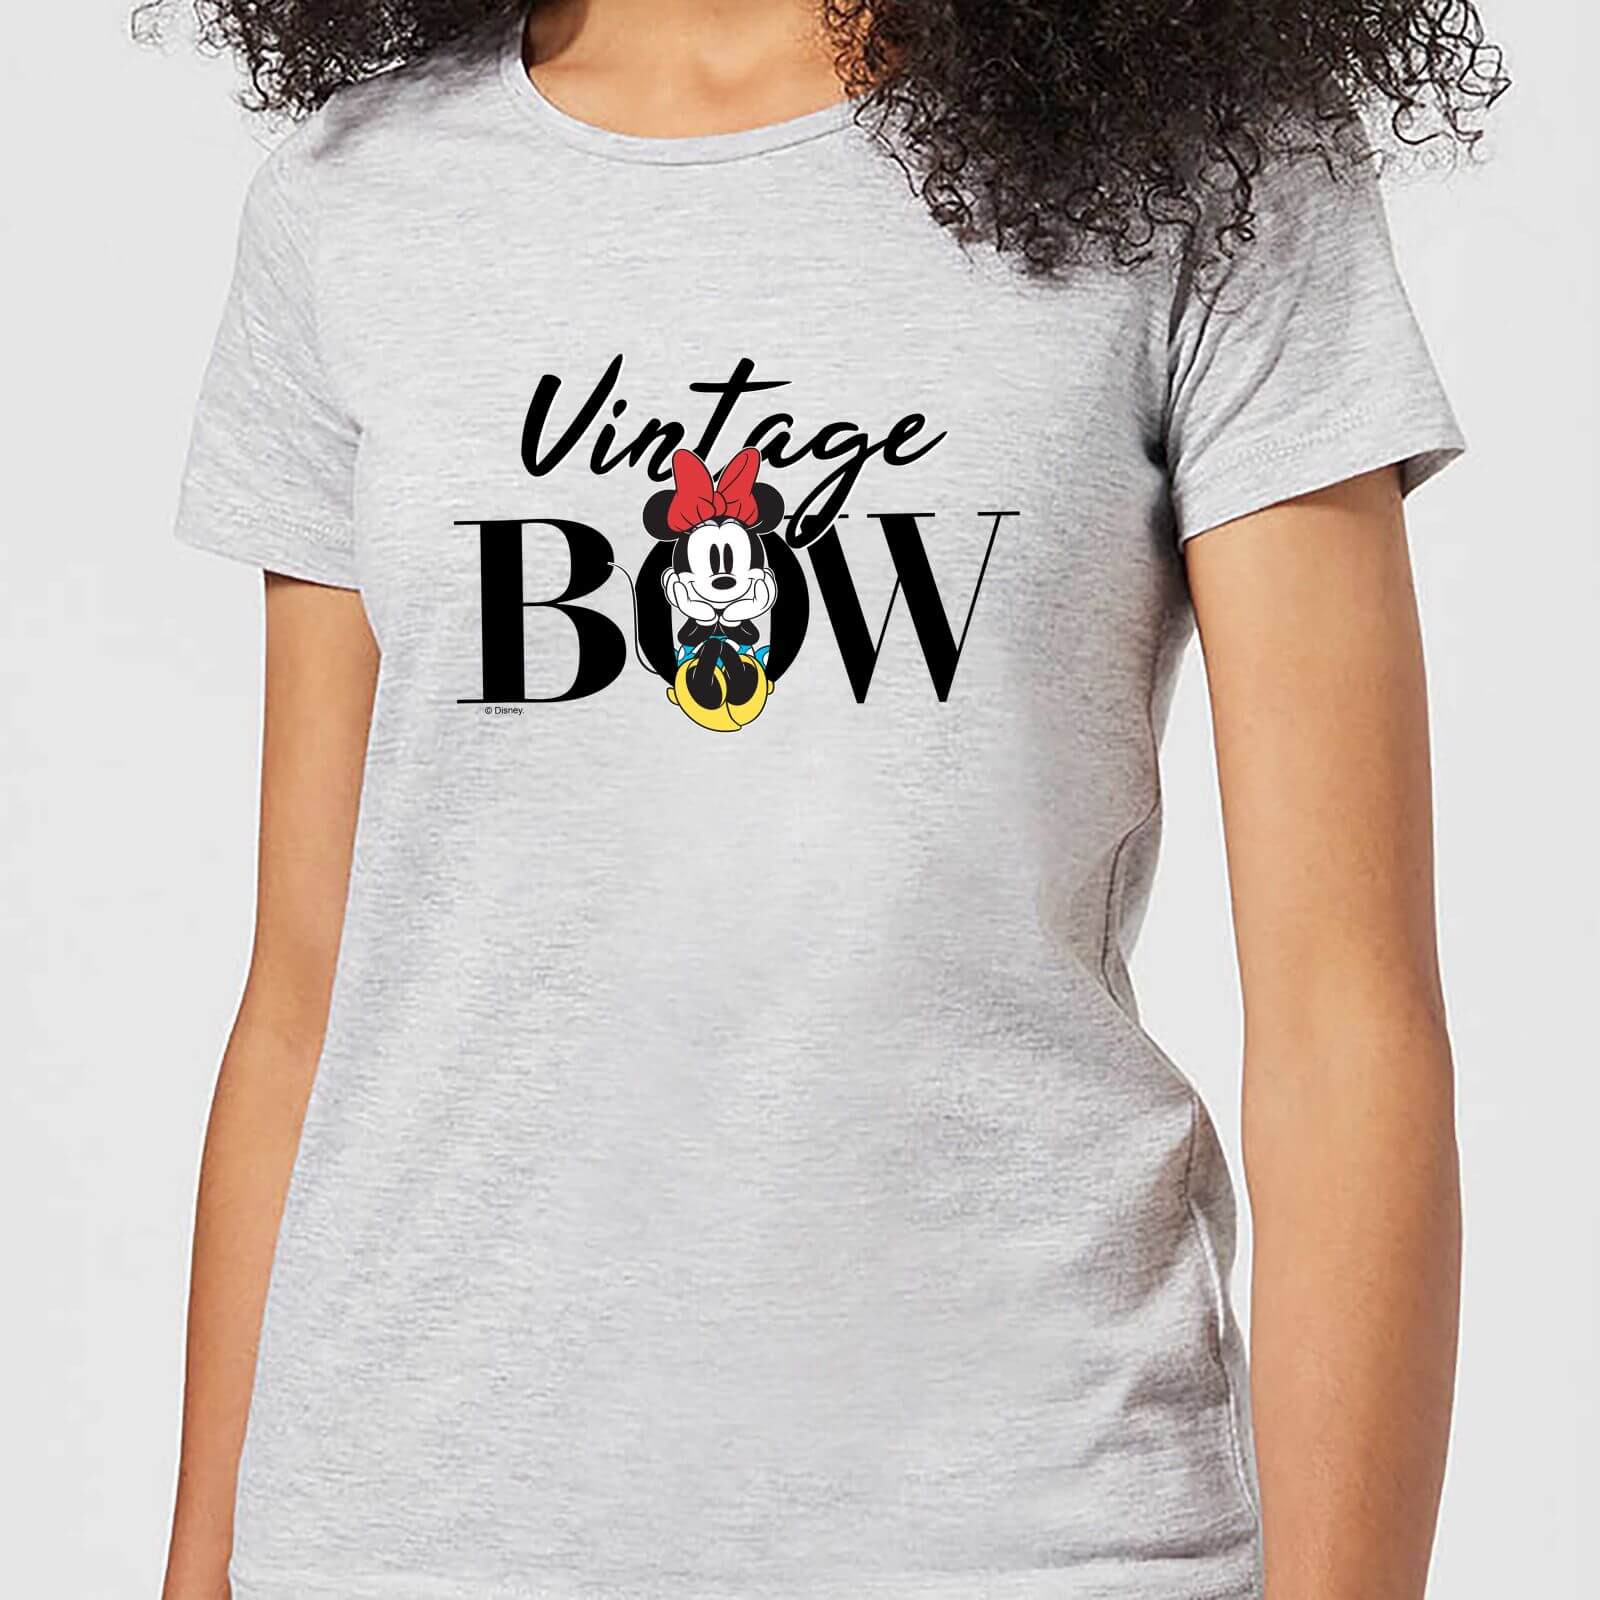 Disney Disney Minnie Mouse Vintage Bow Women's T-Shirt - Grey - 3XL - Grey